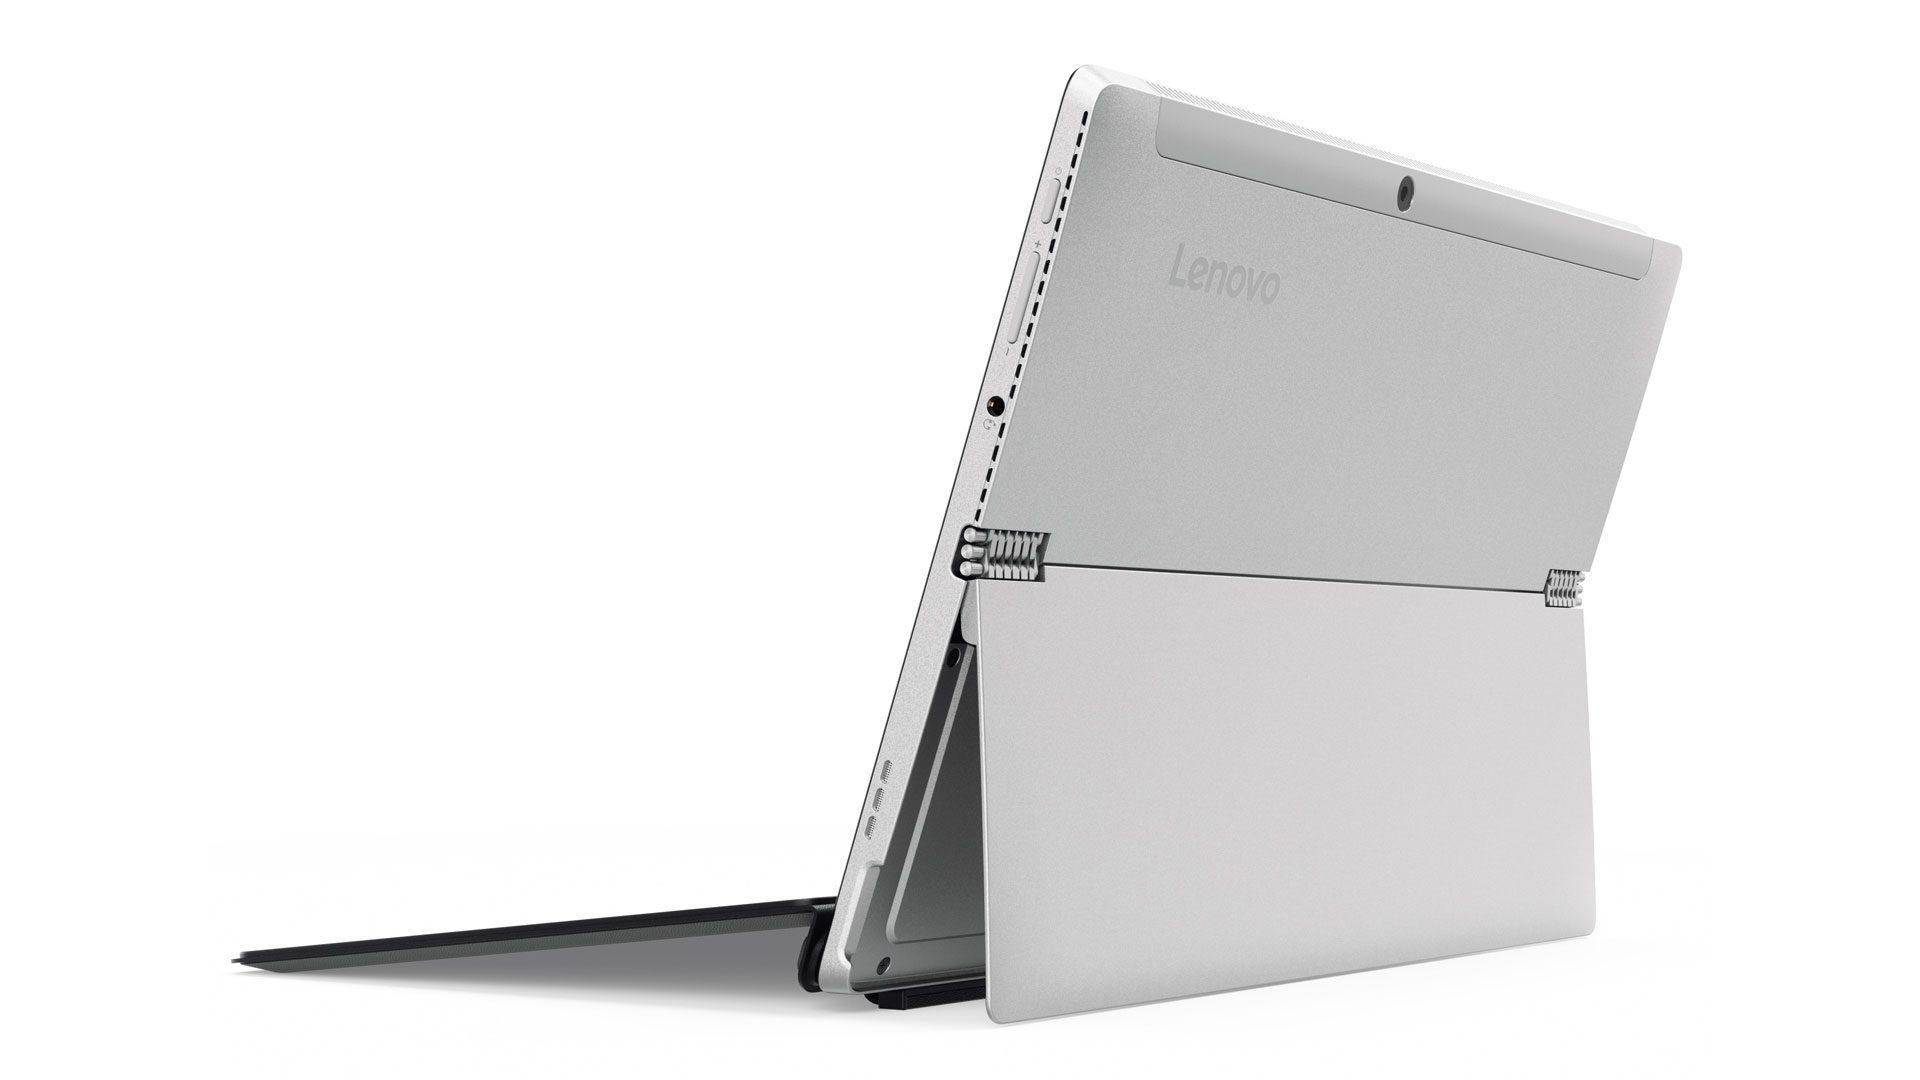 Lenovo-Ideapad-MIIX-510-12IKB_Ansicht-8